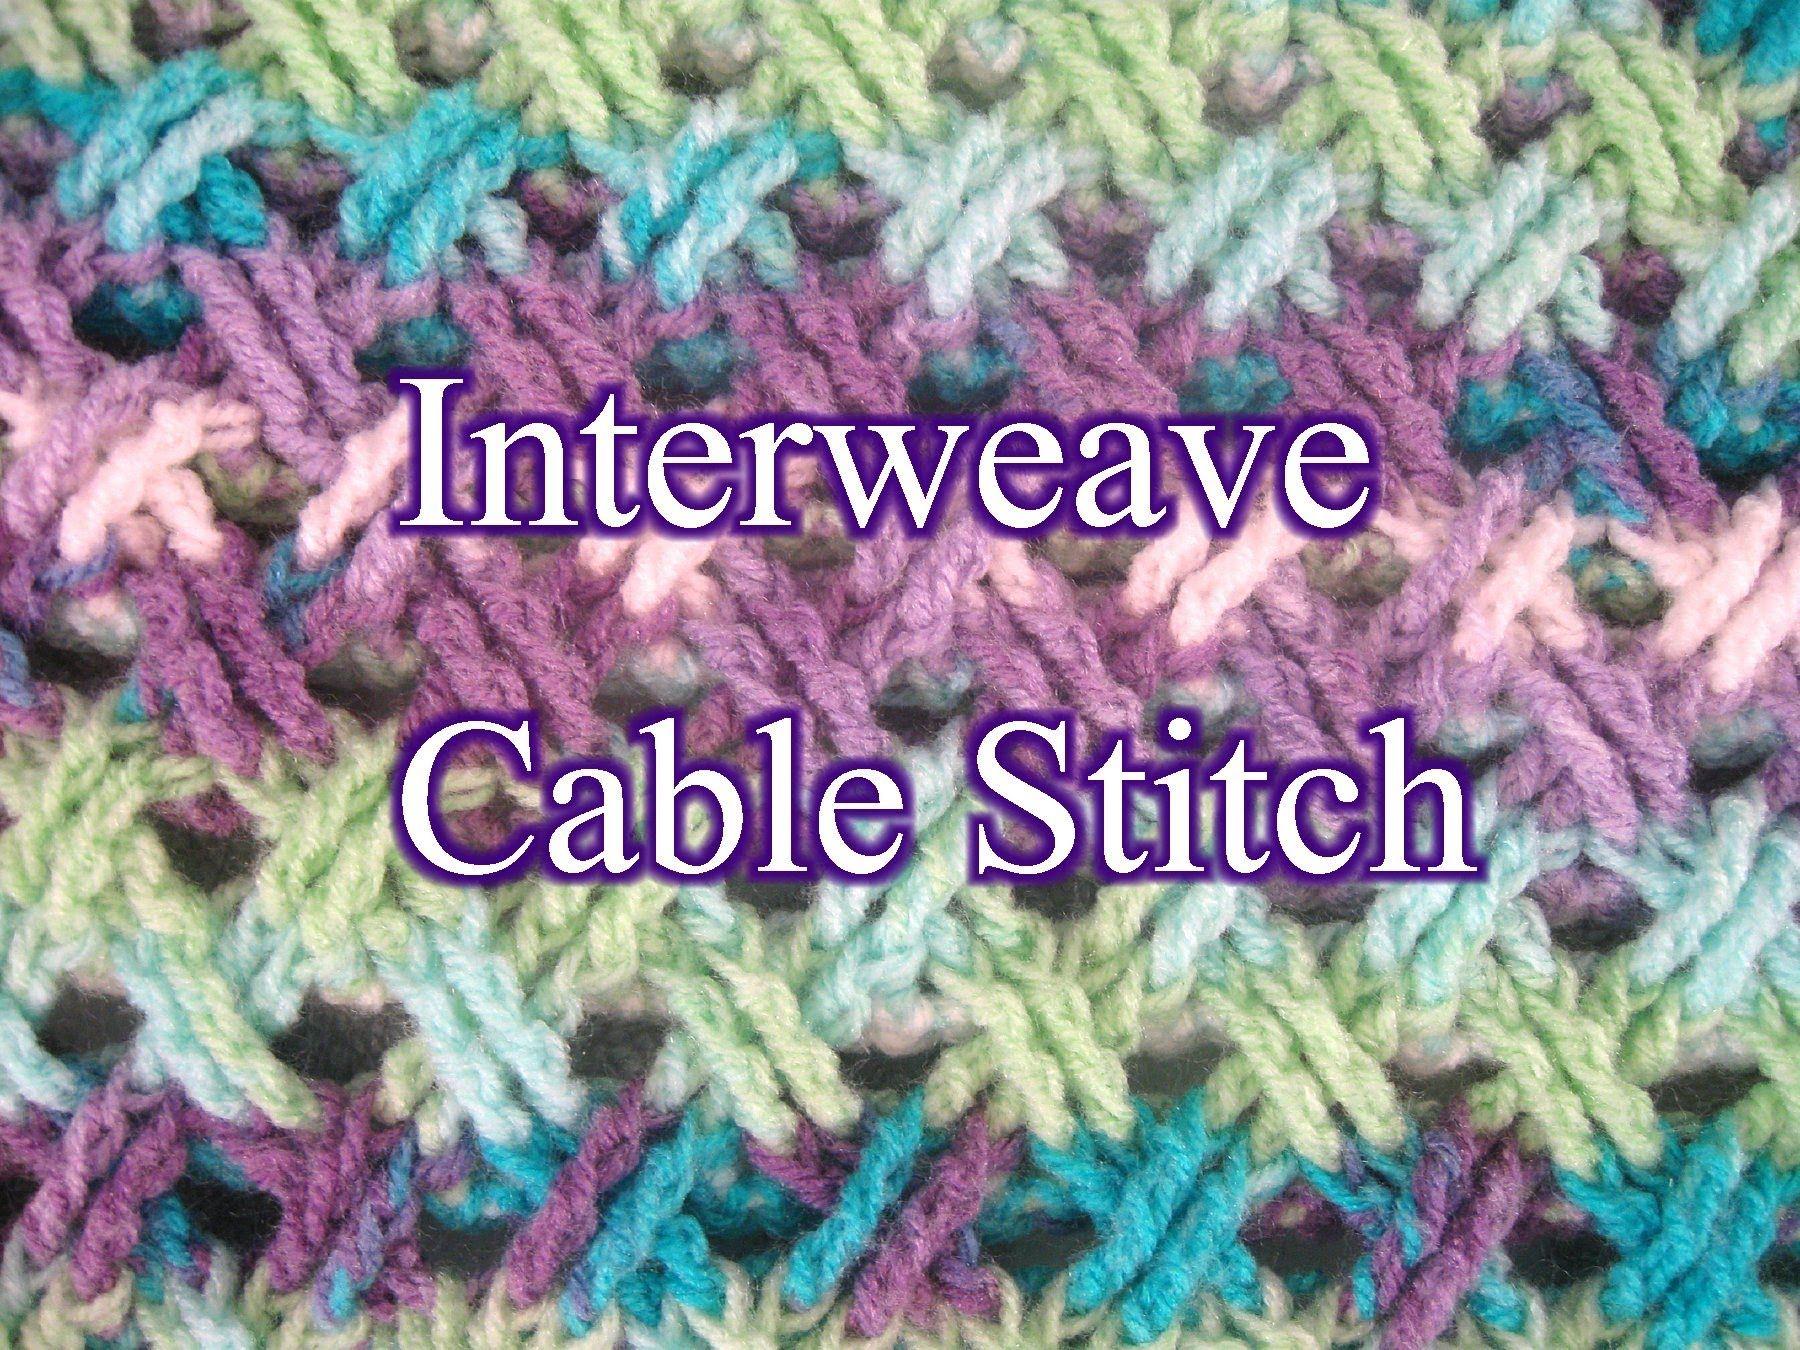 Interweave Cable Stitch - Crochet Stitch Tutorial | Crochet ...